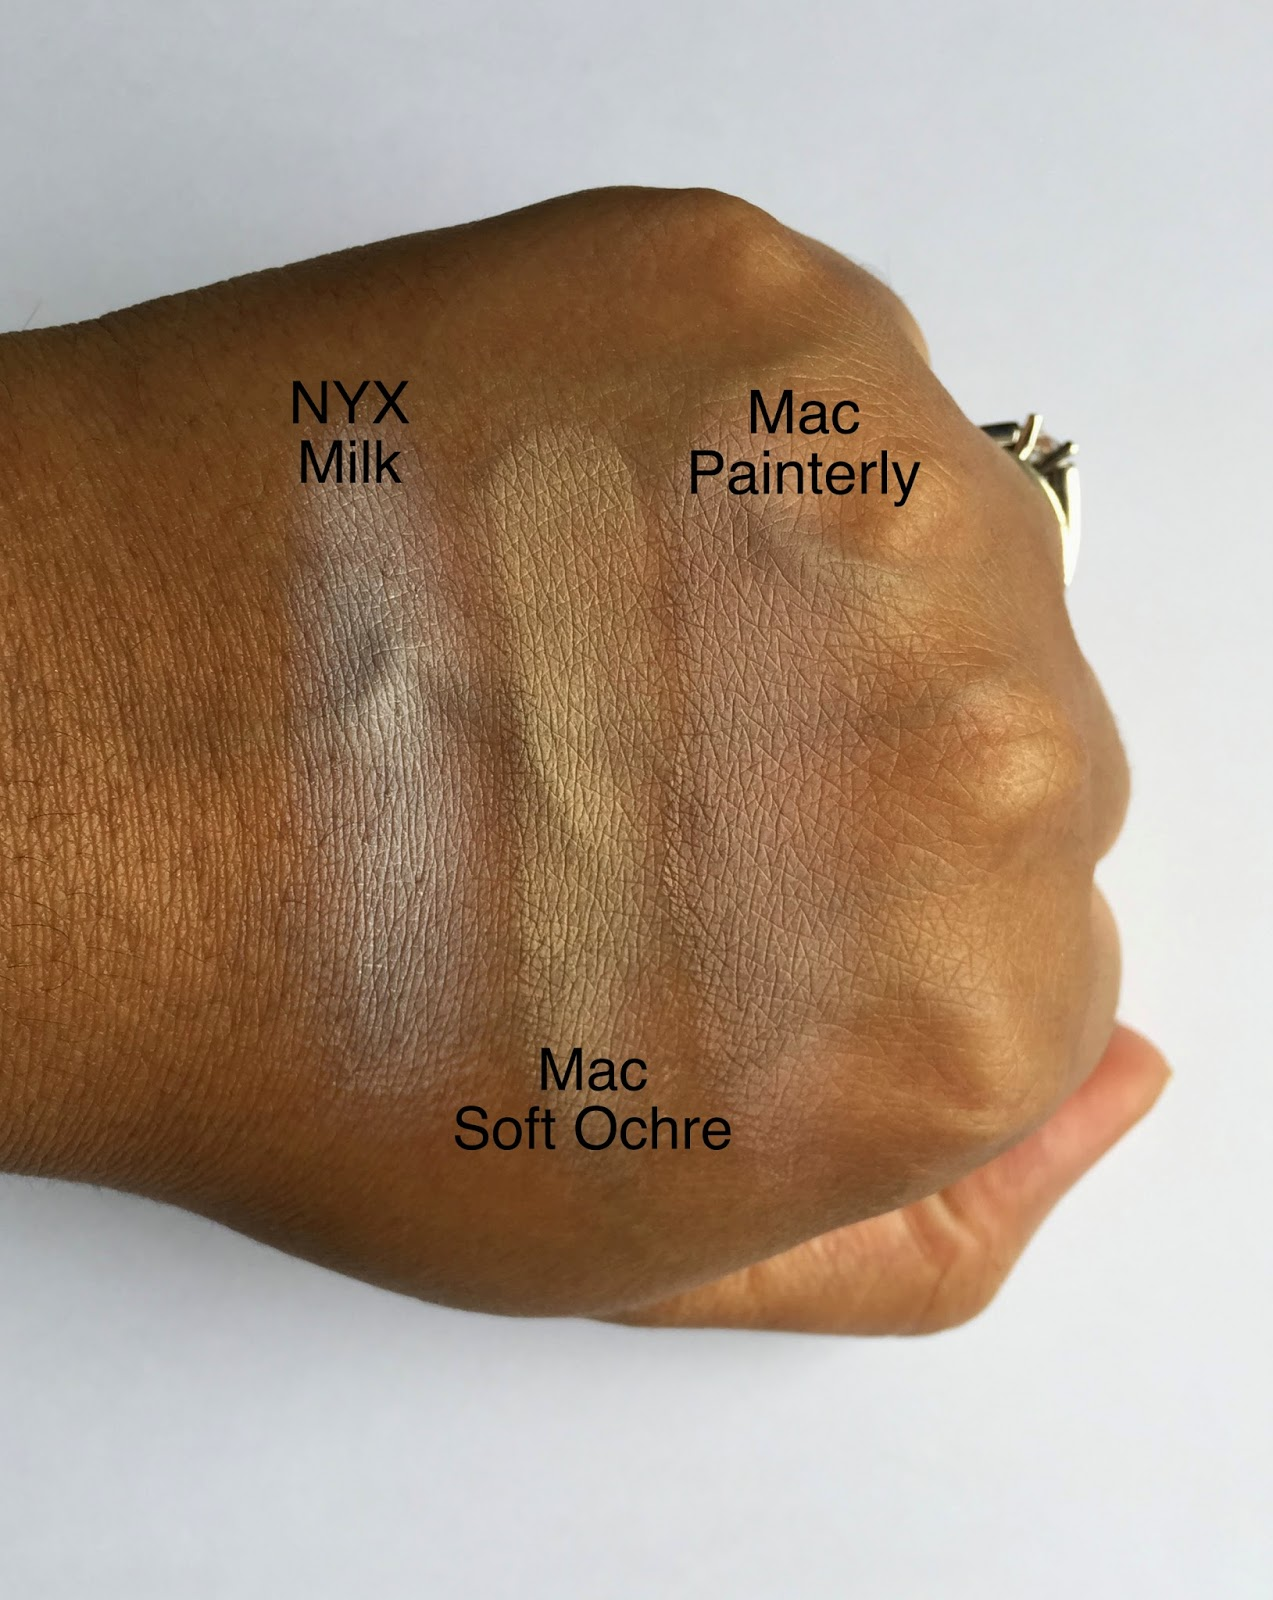 mac paint pot for darker skin